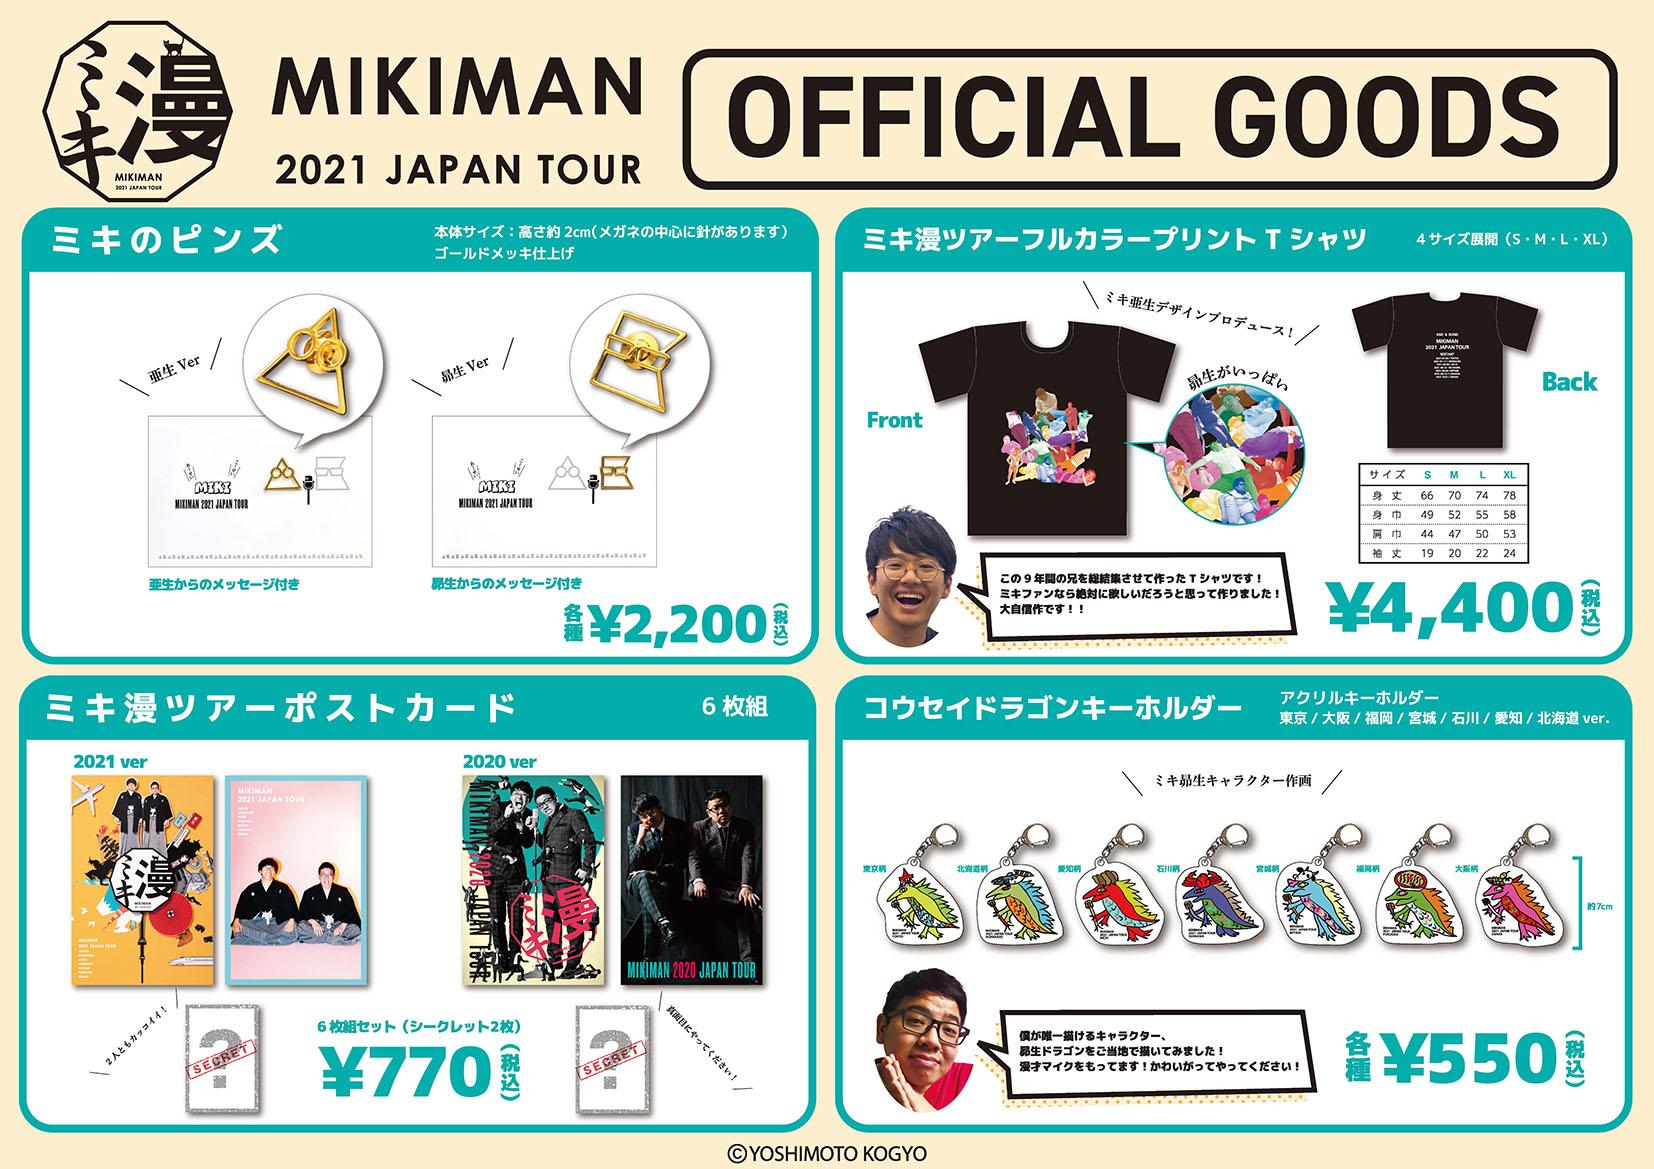 MIKIMAN 2021 JAPAN TOUR OFFICIAL GOODS 一覧